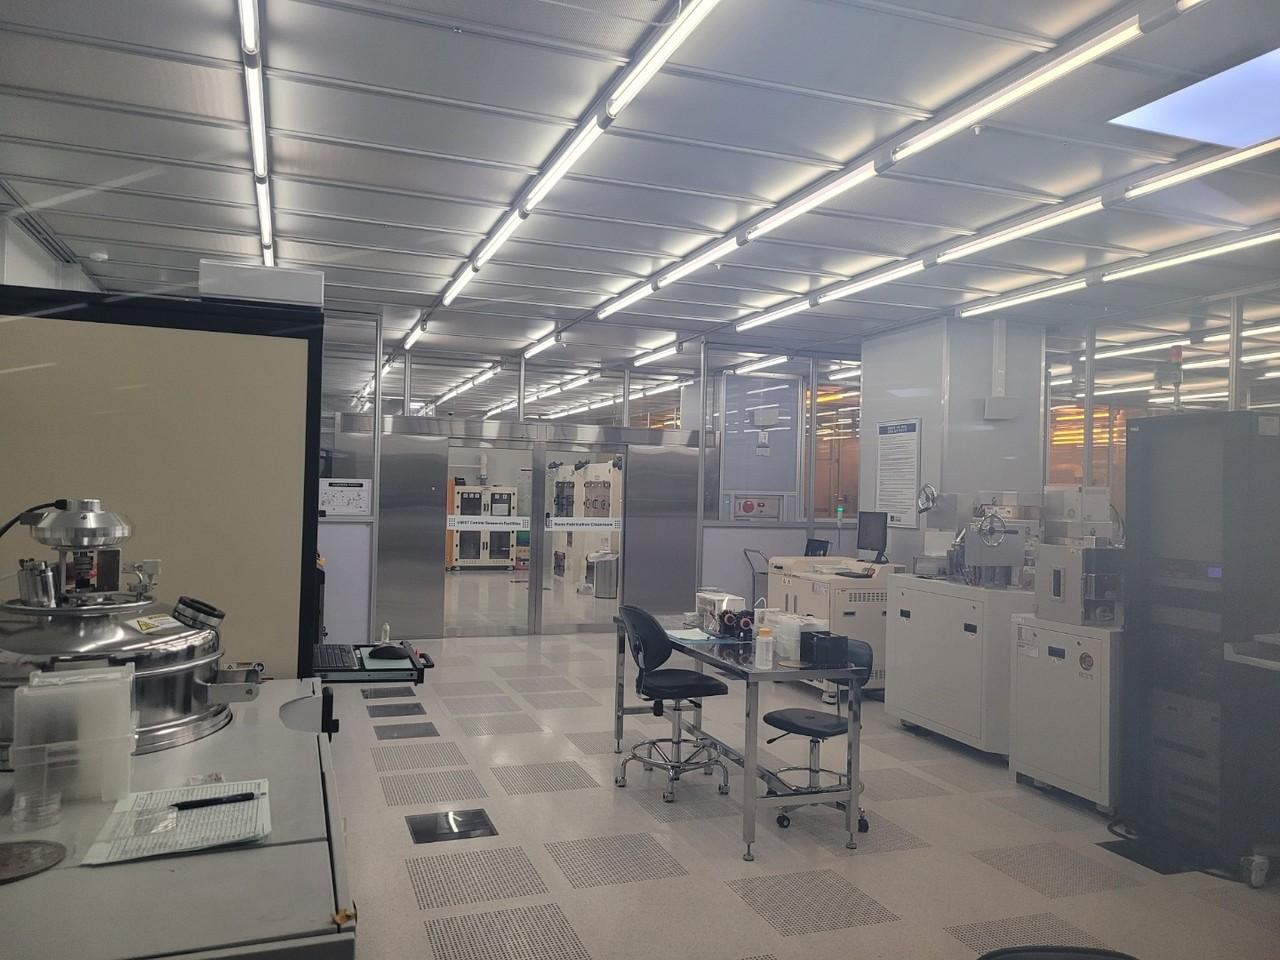 UNIST 연구지원본부(UCRF) 외관. 이곳에서 교내 연구진뿐만 아니라 지역 산업체도 기술을 검증하고 있다. [사진=김인한 기자]